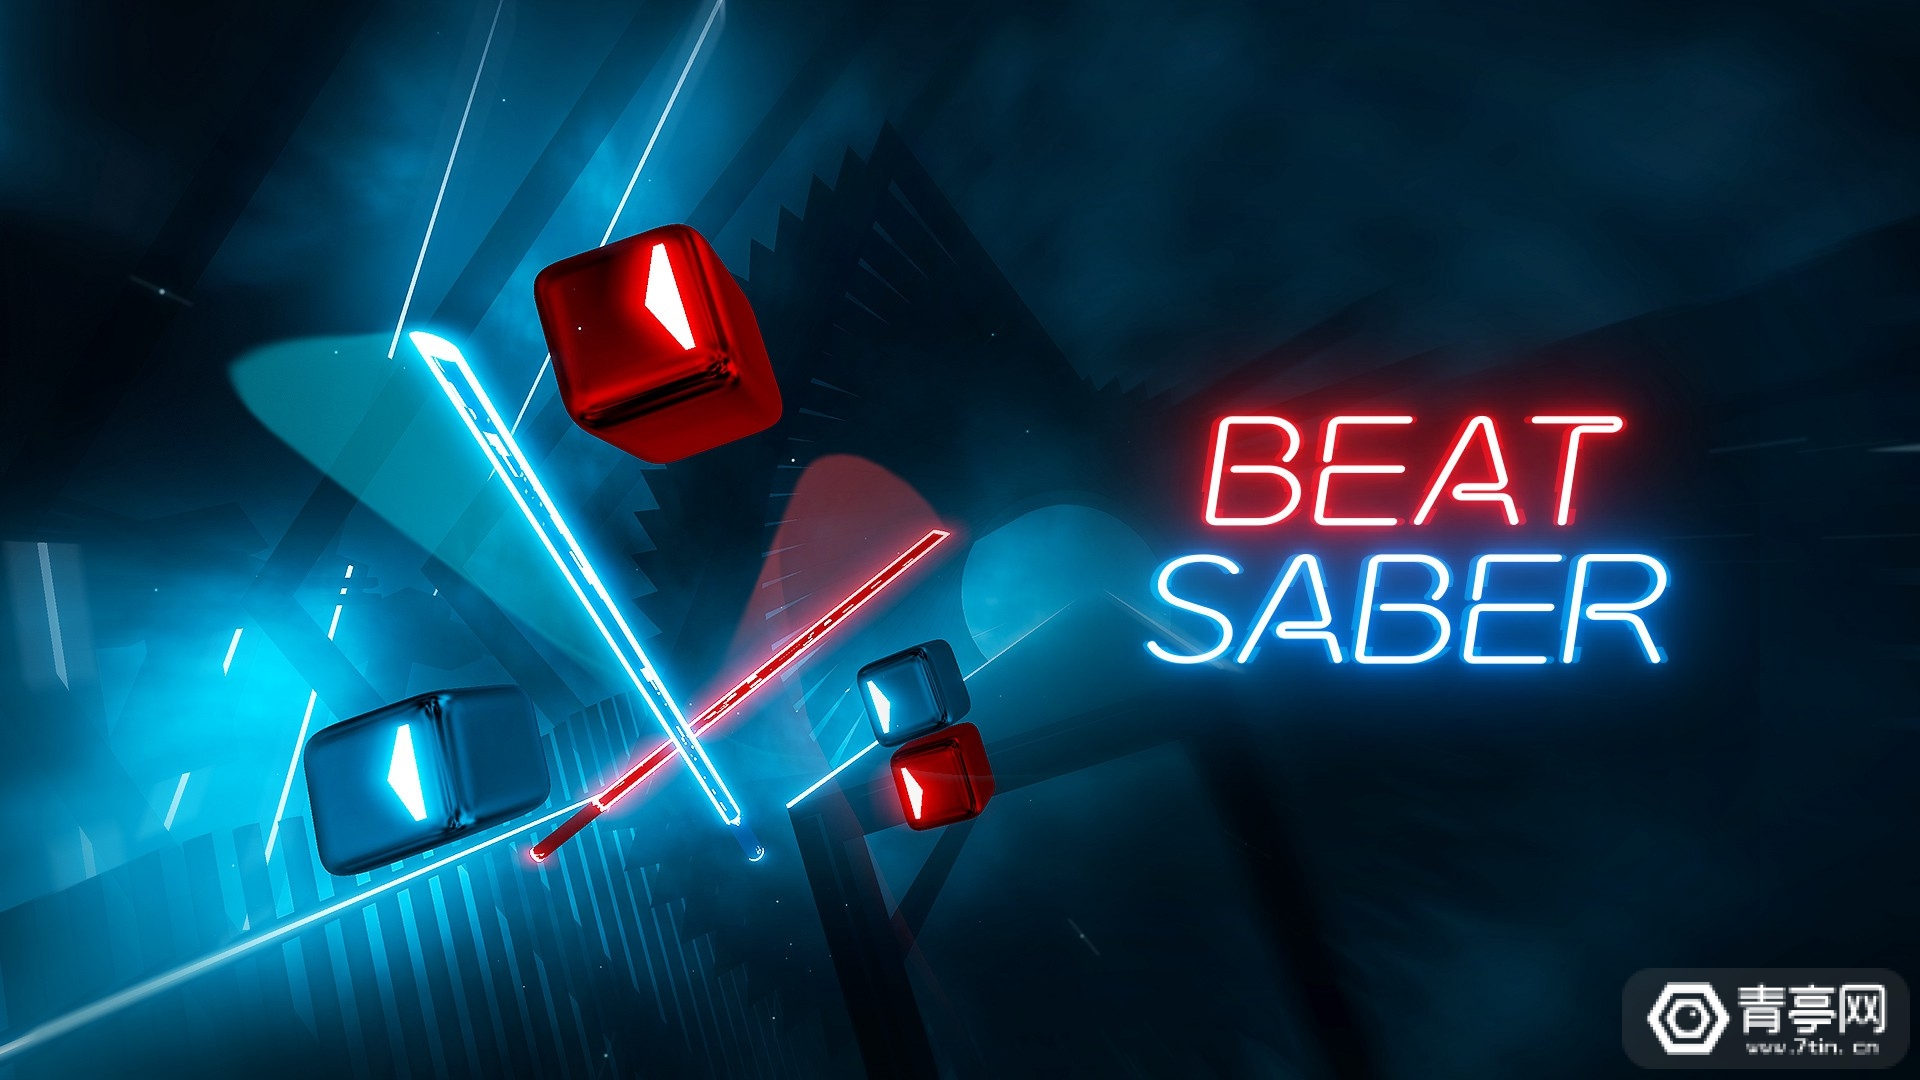 《Beat Saber》将于5.21日升级正式版,并加入关卡编辑器